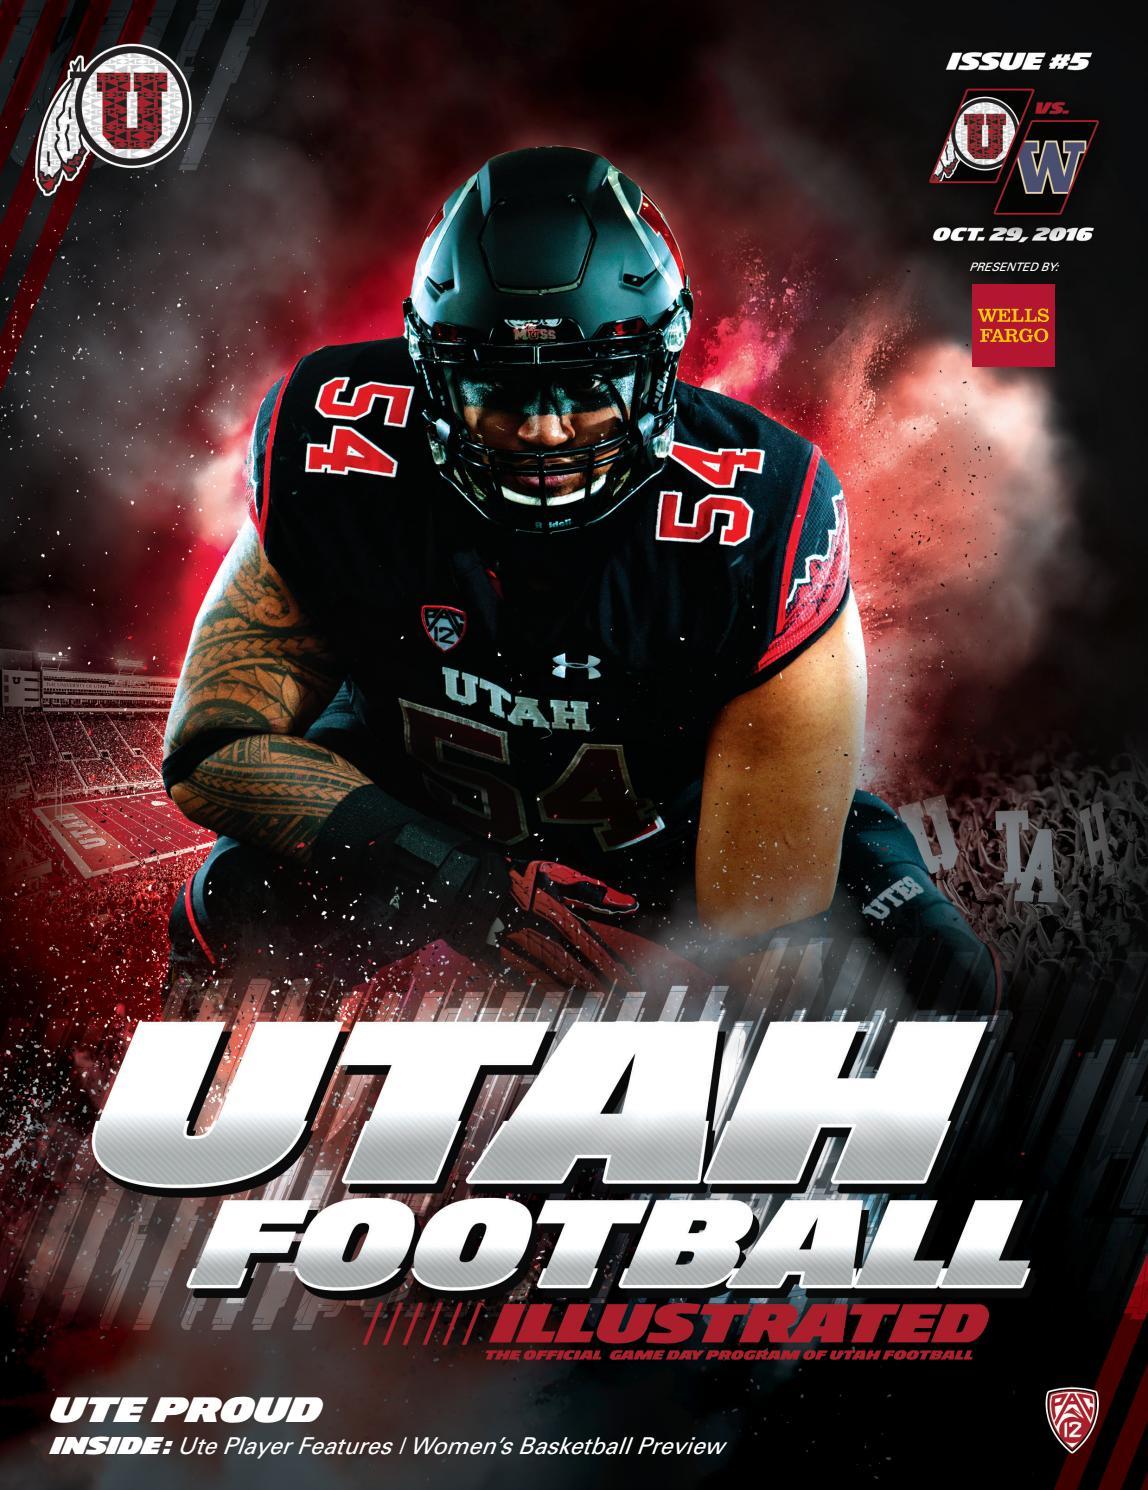 Utah Football vs. Washington by Mills Publishing Sports - issuu 505f7bea1